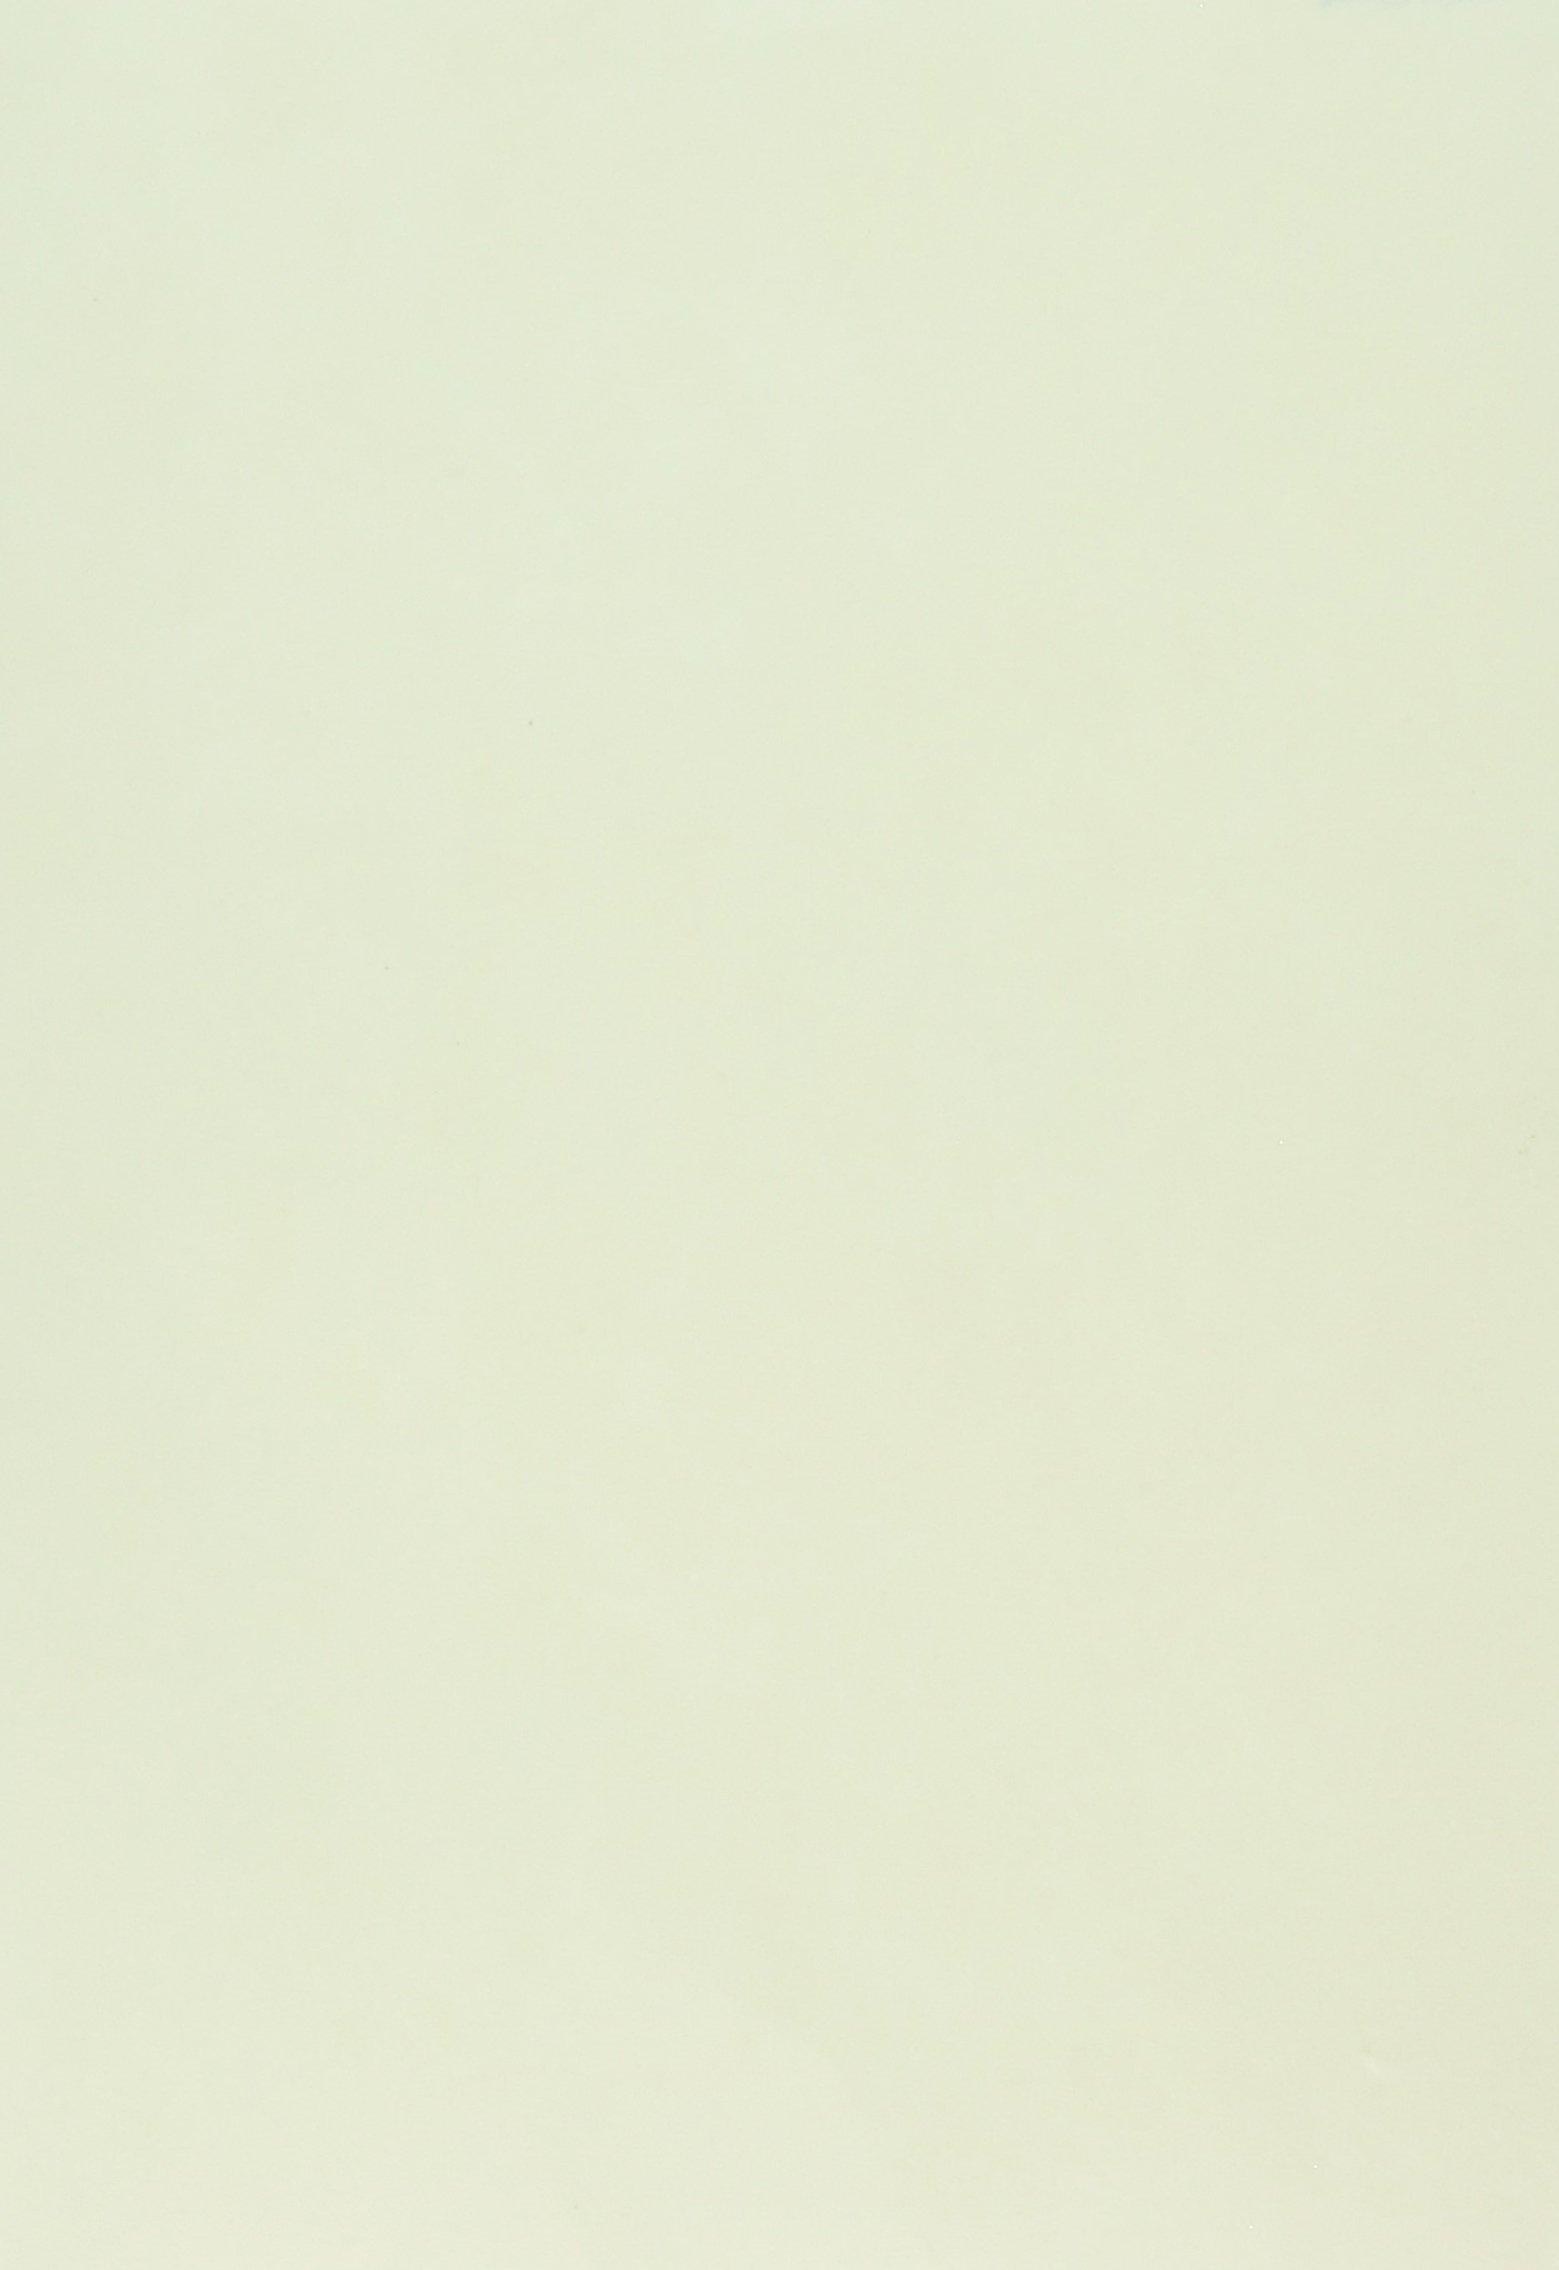 Awagami Kozo Thin Natural Fine Art Inkjet Paper, 70gsm A4 (8.27'' x 11.69'') 20 Sheets by Awagami